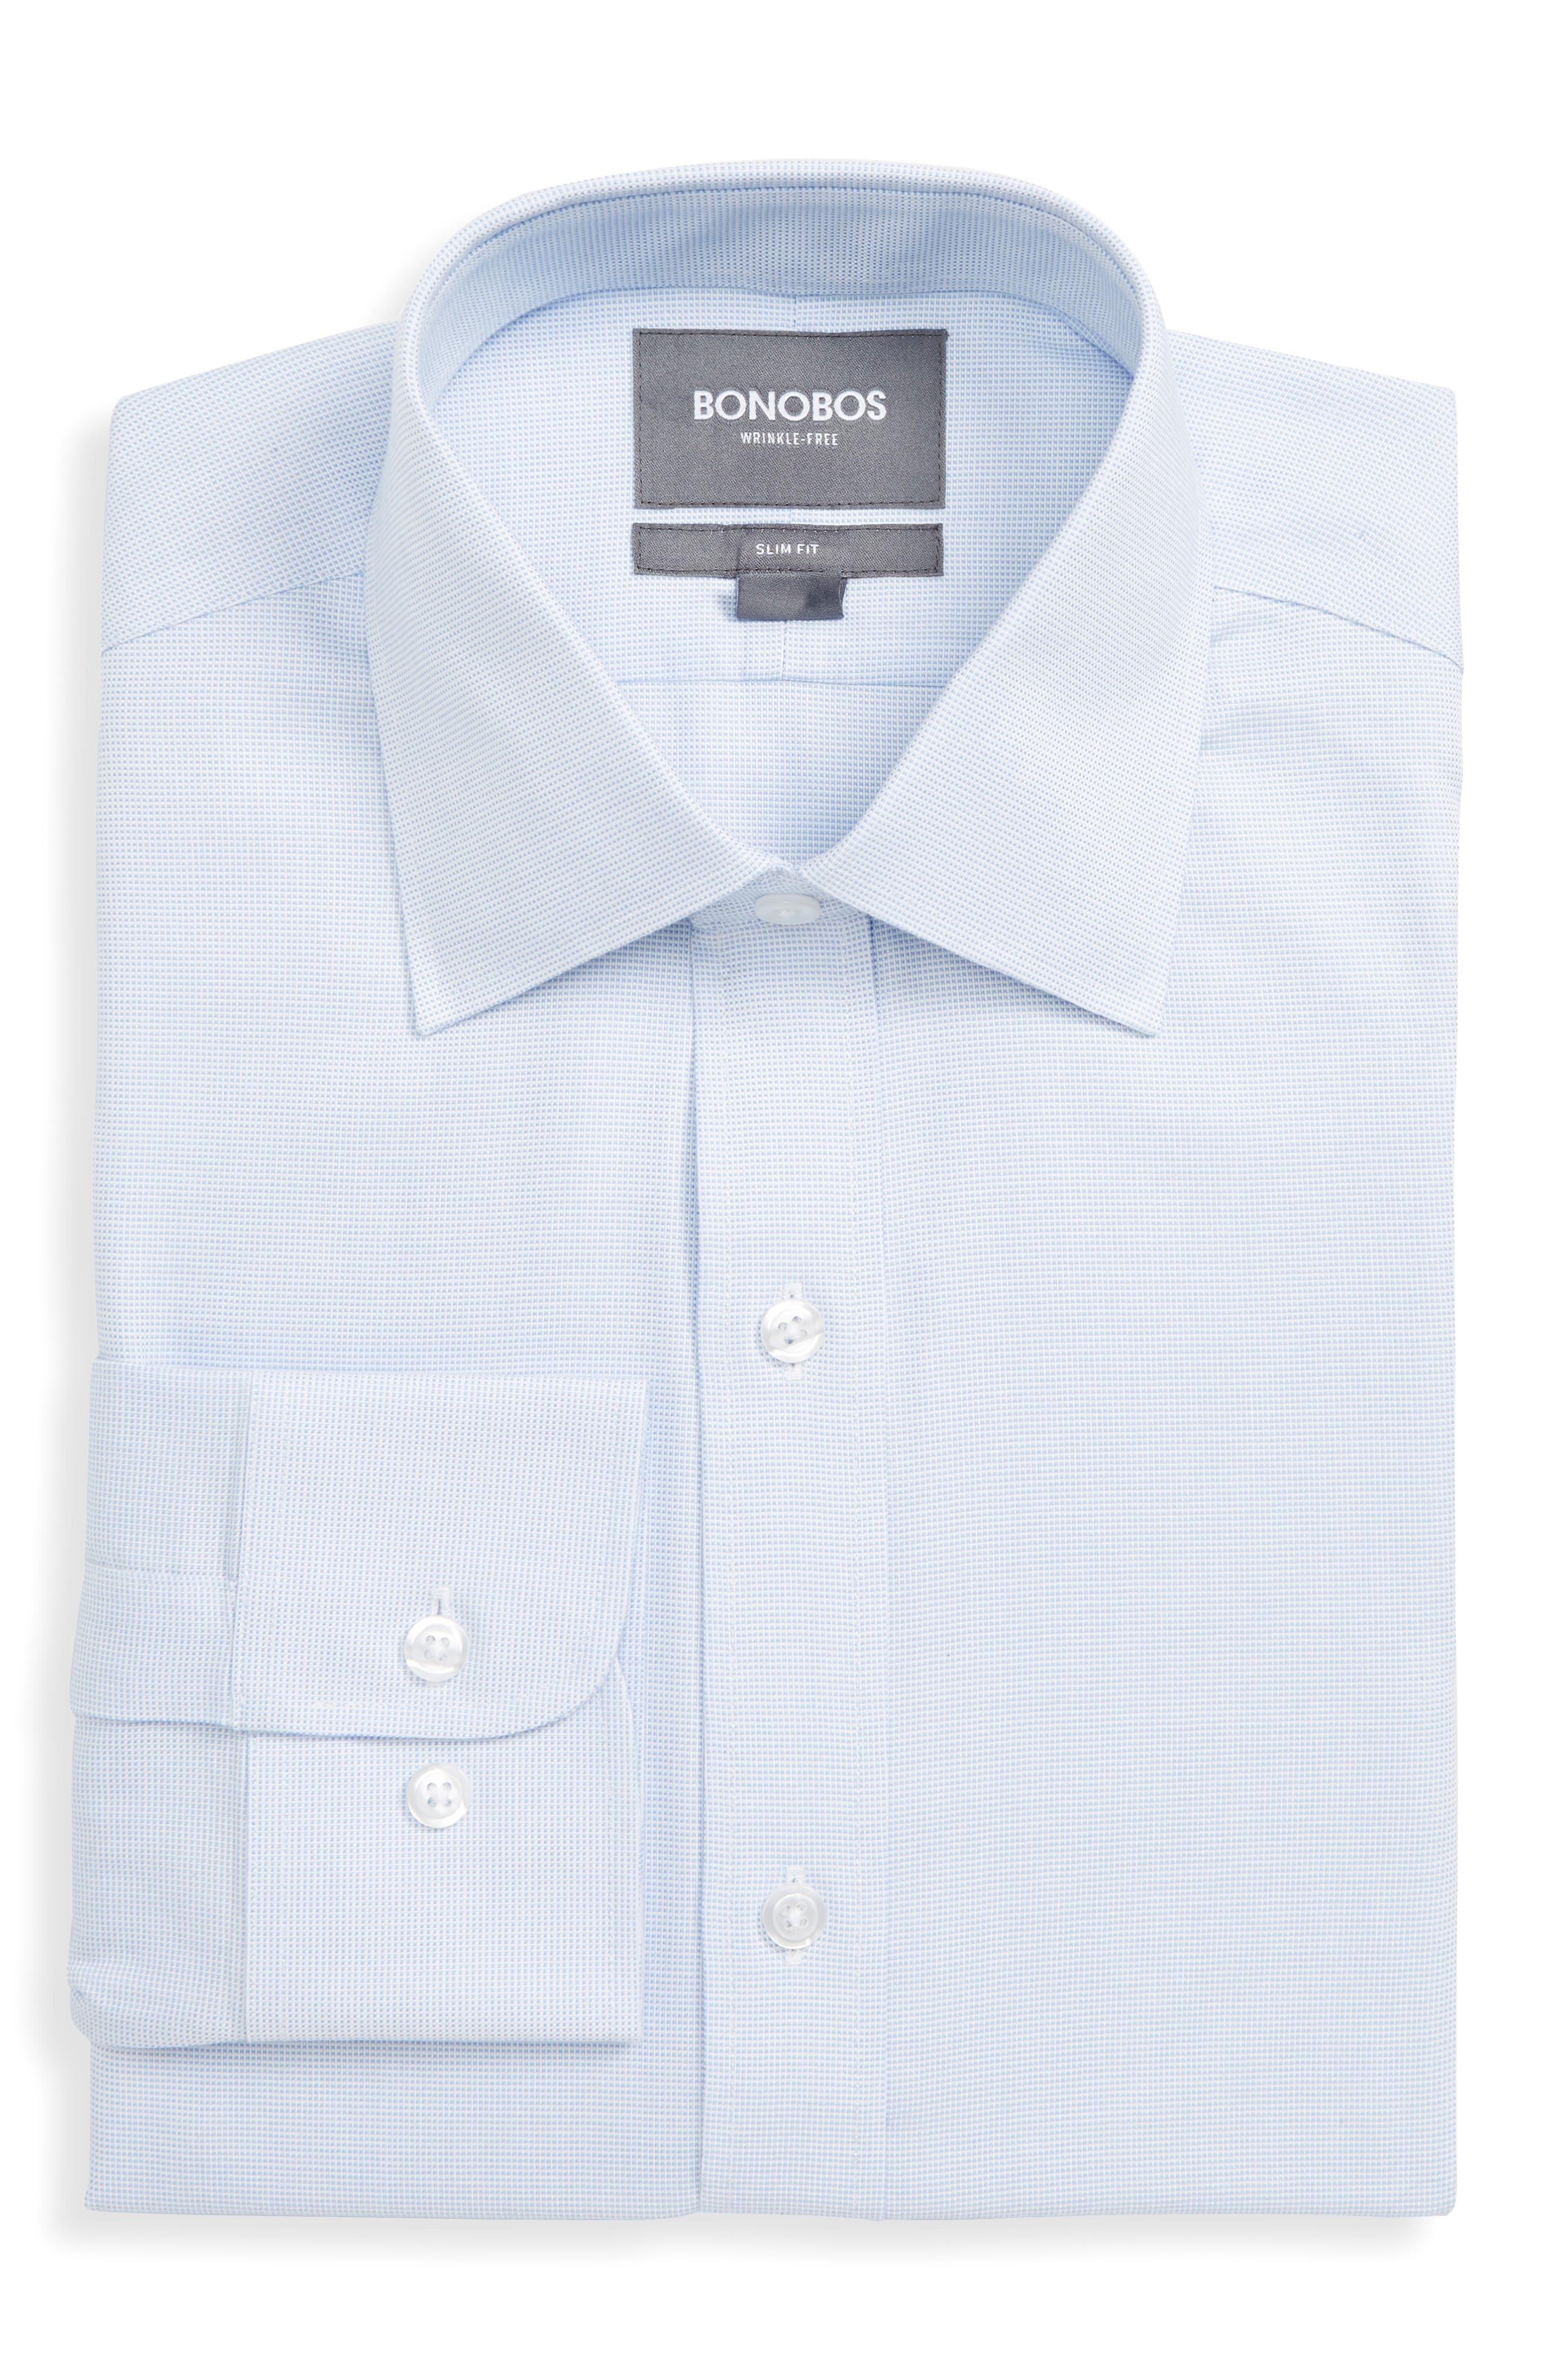 Bonobos Daily Grind Slim Fit Solid Dress Shirt, Blue